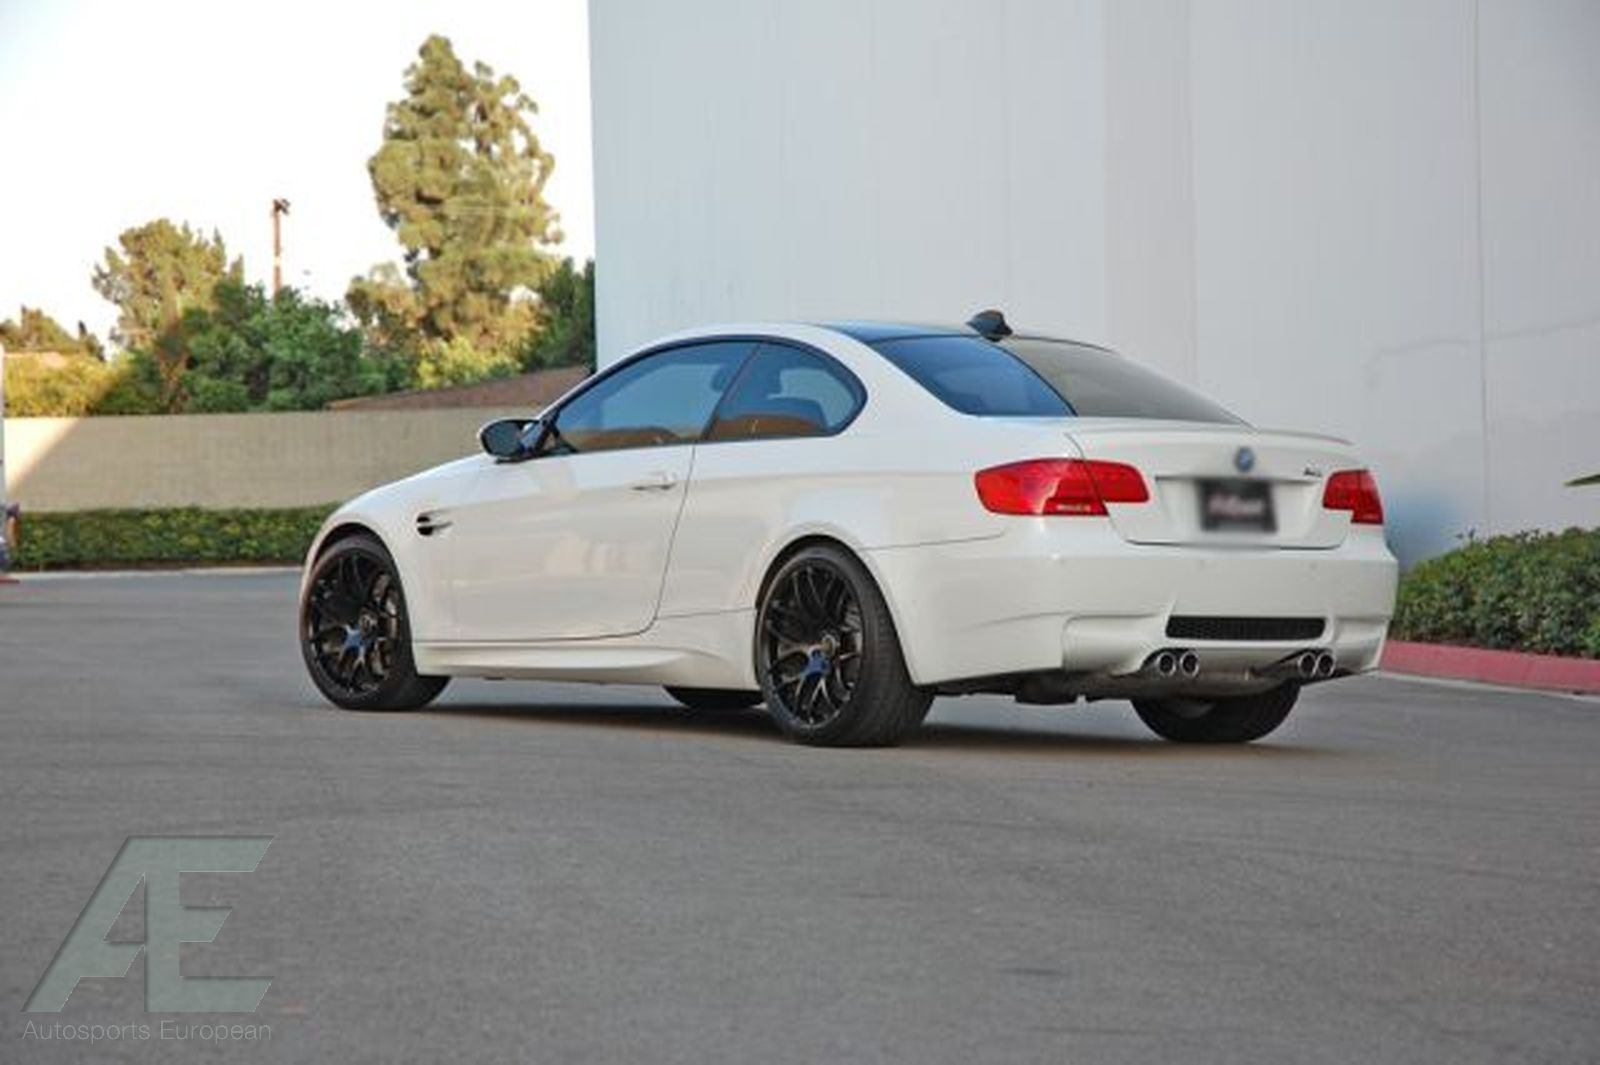 18 BMW Wheels Rim Tires 325i 325xi 325CI E46 E90 M3